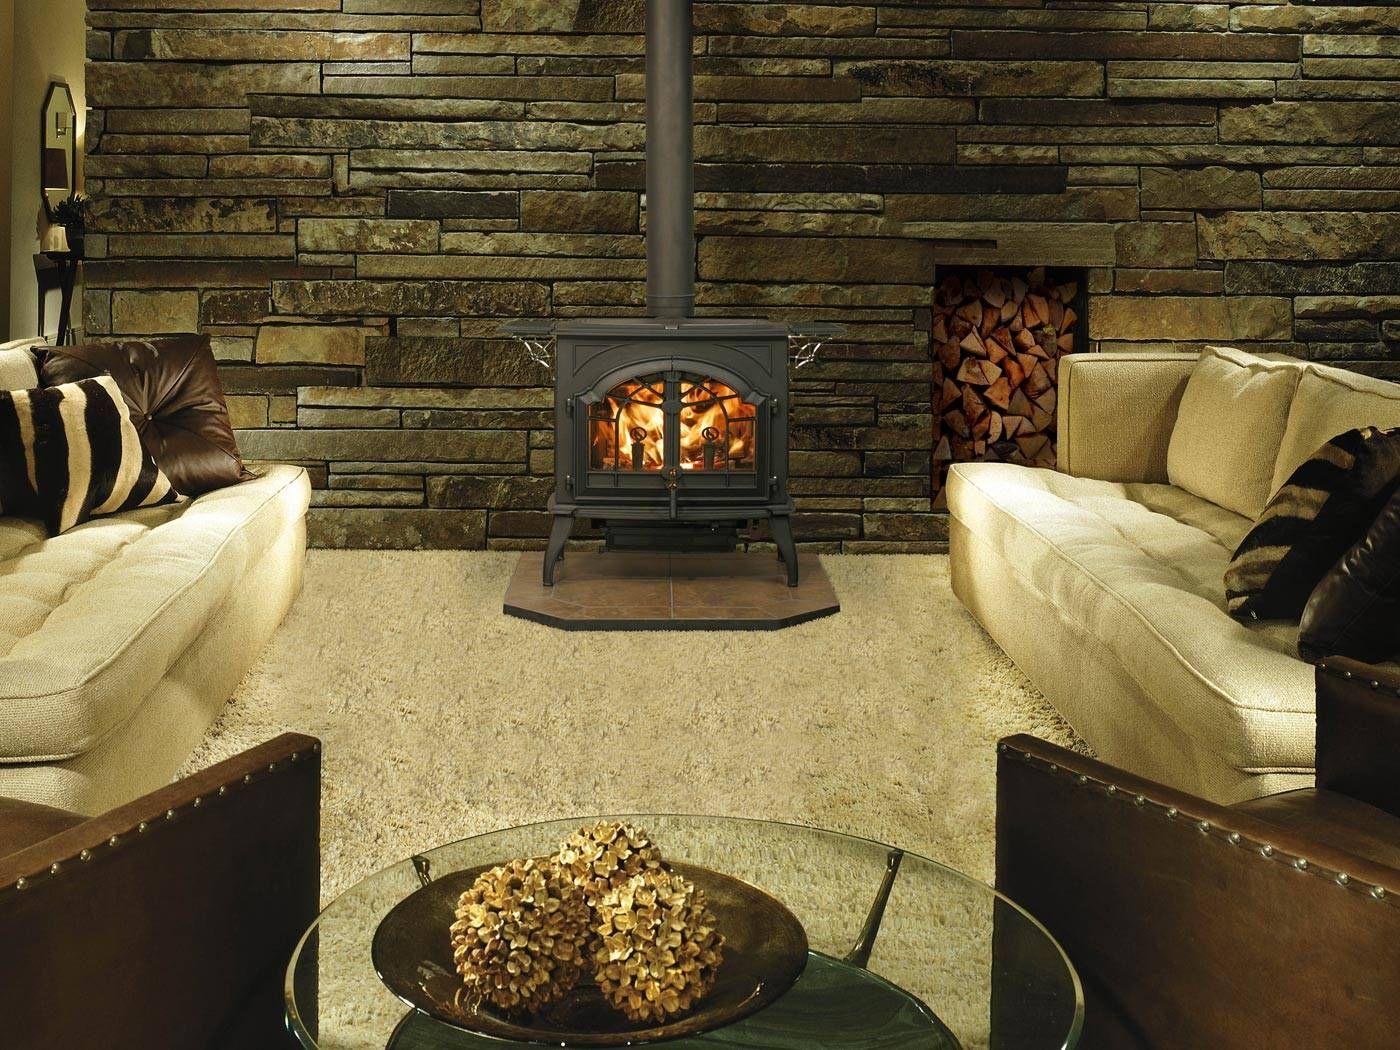 Quadra-Fire | Isle Royale Wood Stove | Design | Pinterest | Cooker ...